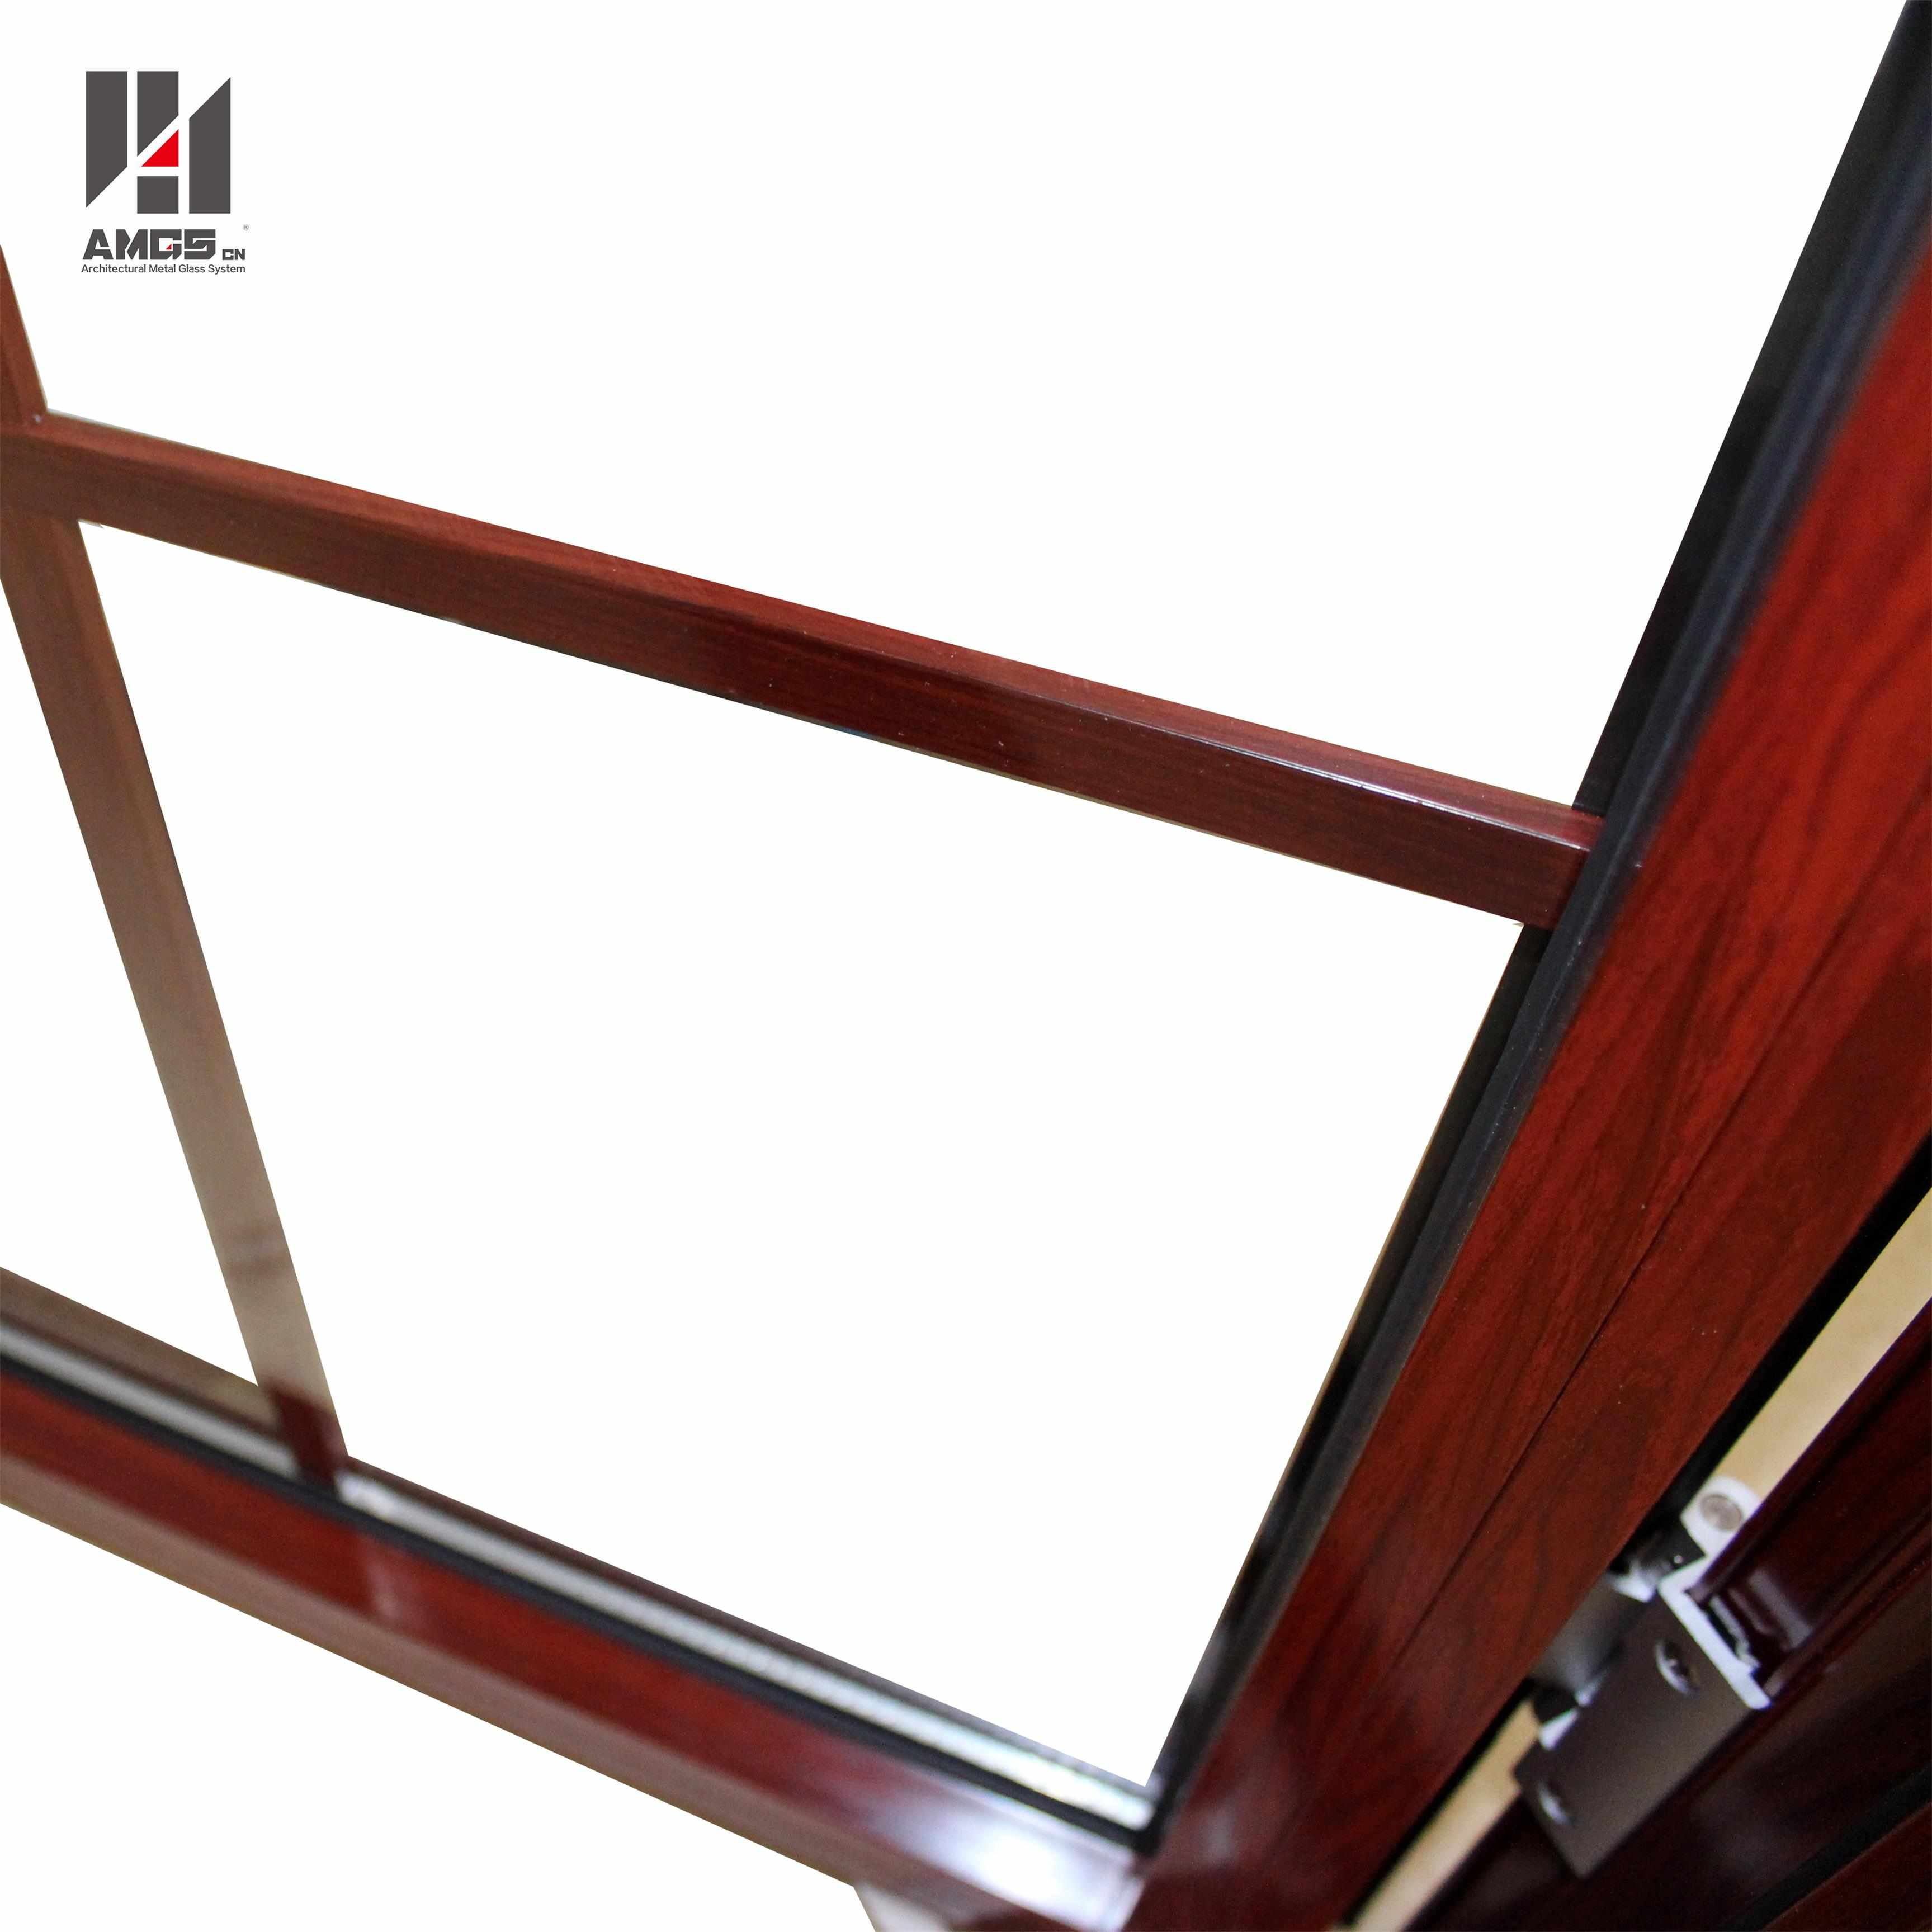 AMGS American Style Aluminum Casement Window With Crank Handle Aluminum Casement Windows image3